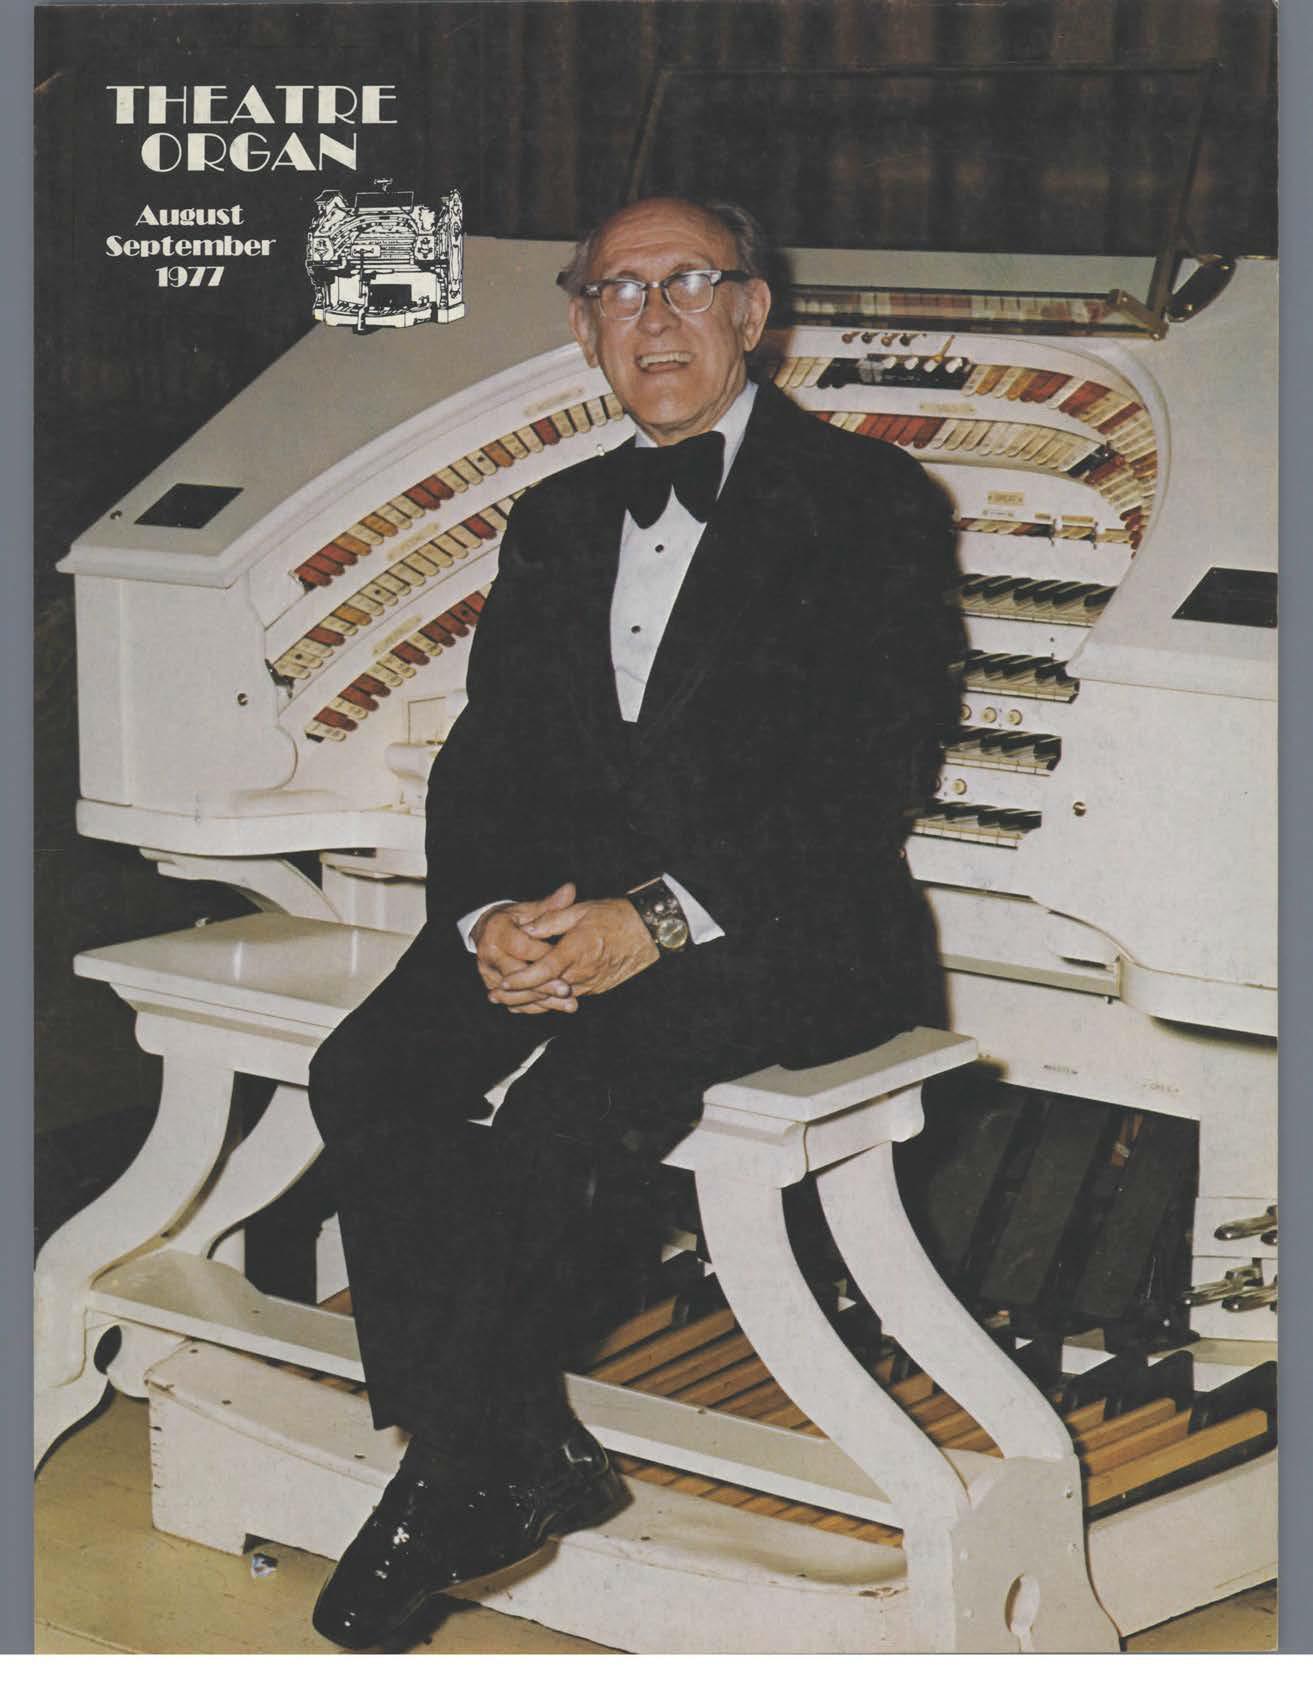 Theatre Organ, August - September 1977, Volume 19, Number 4